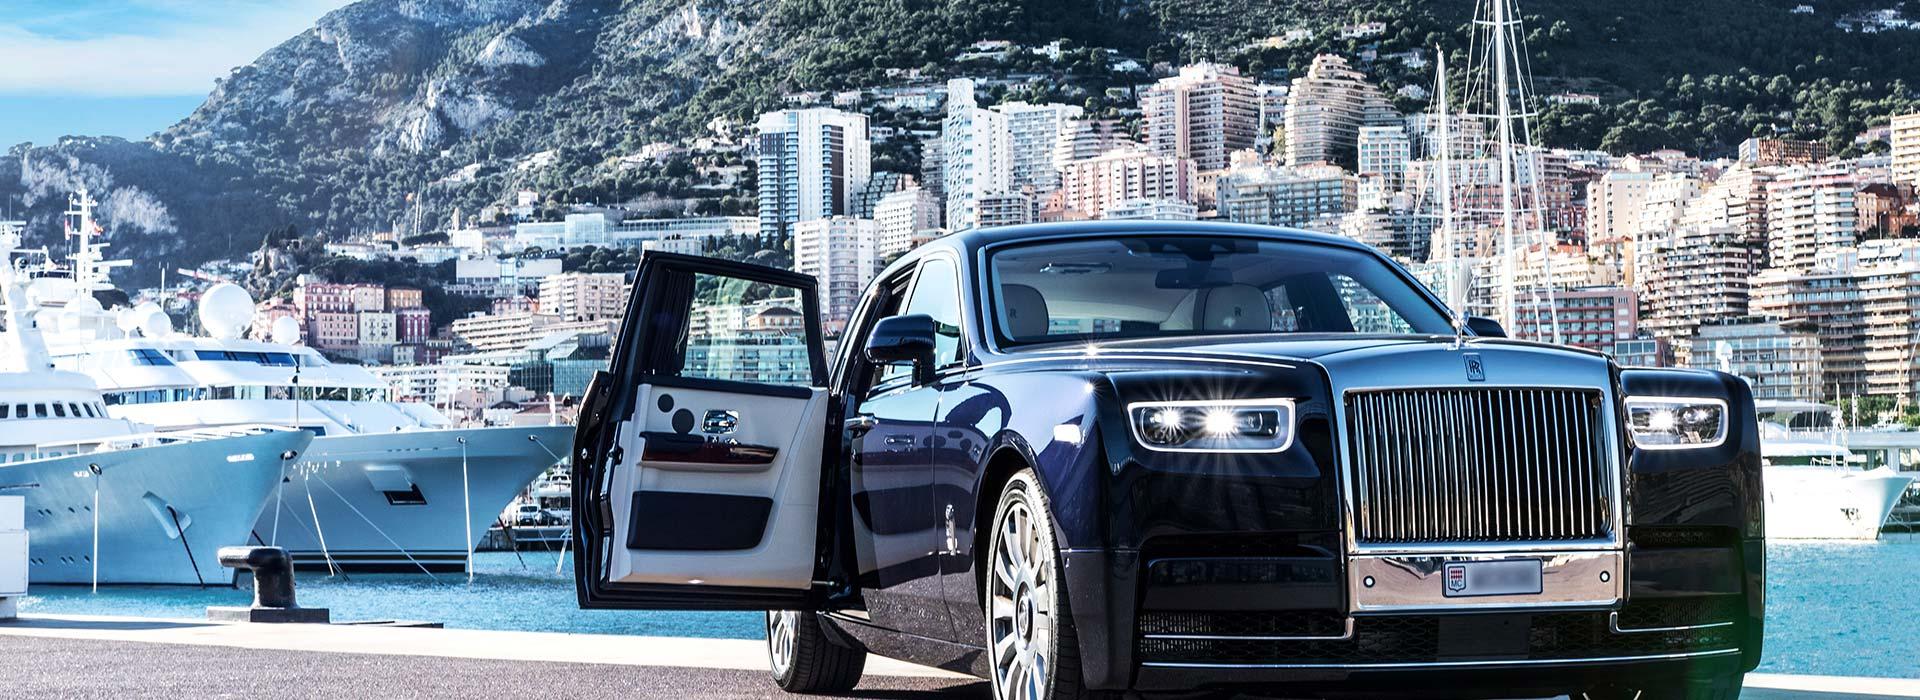 Worldwide chauffeur service bg |